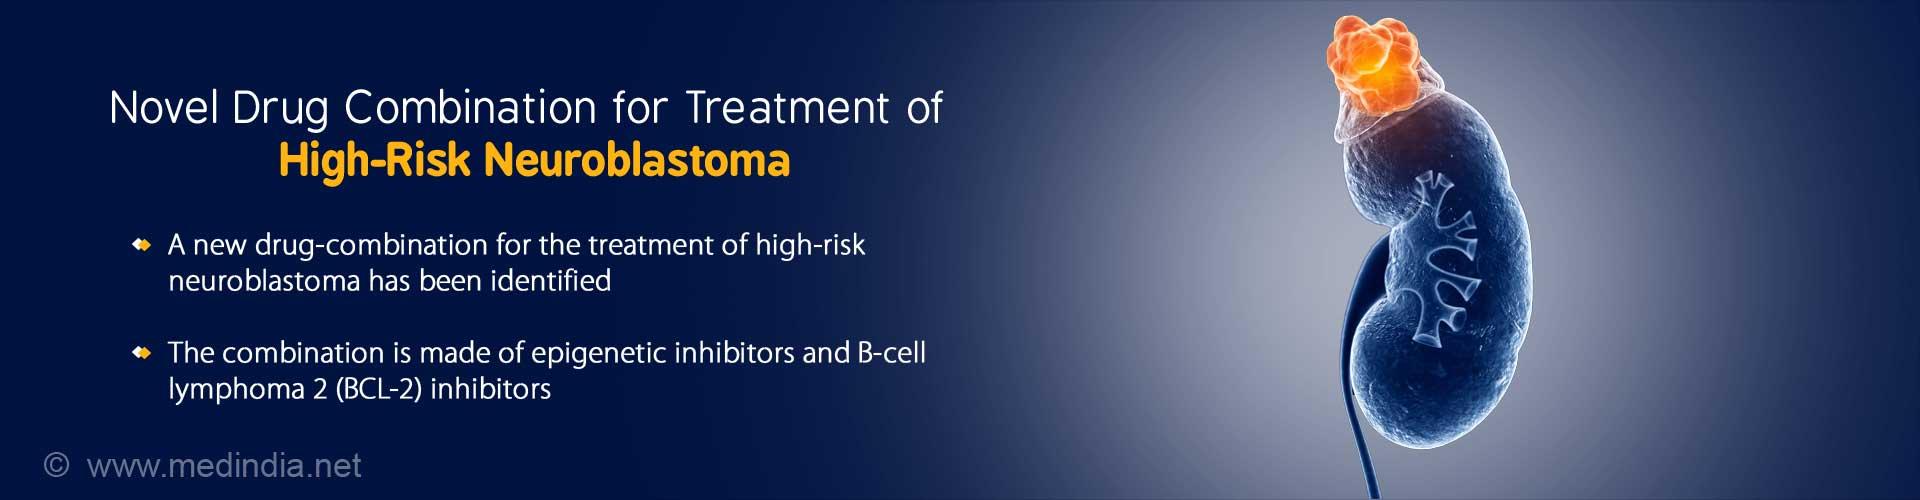 New Drug Combination for High-Risk Neuroblastoma